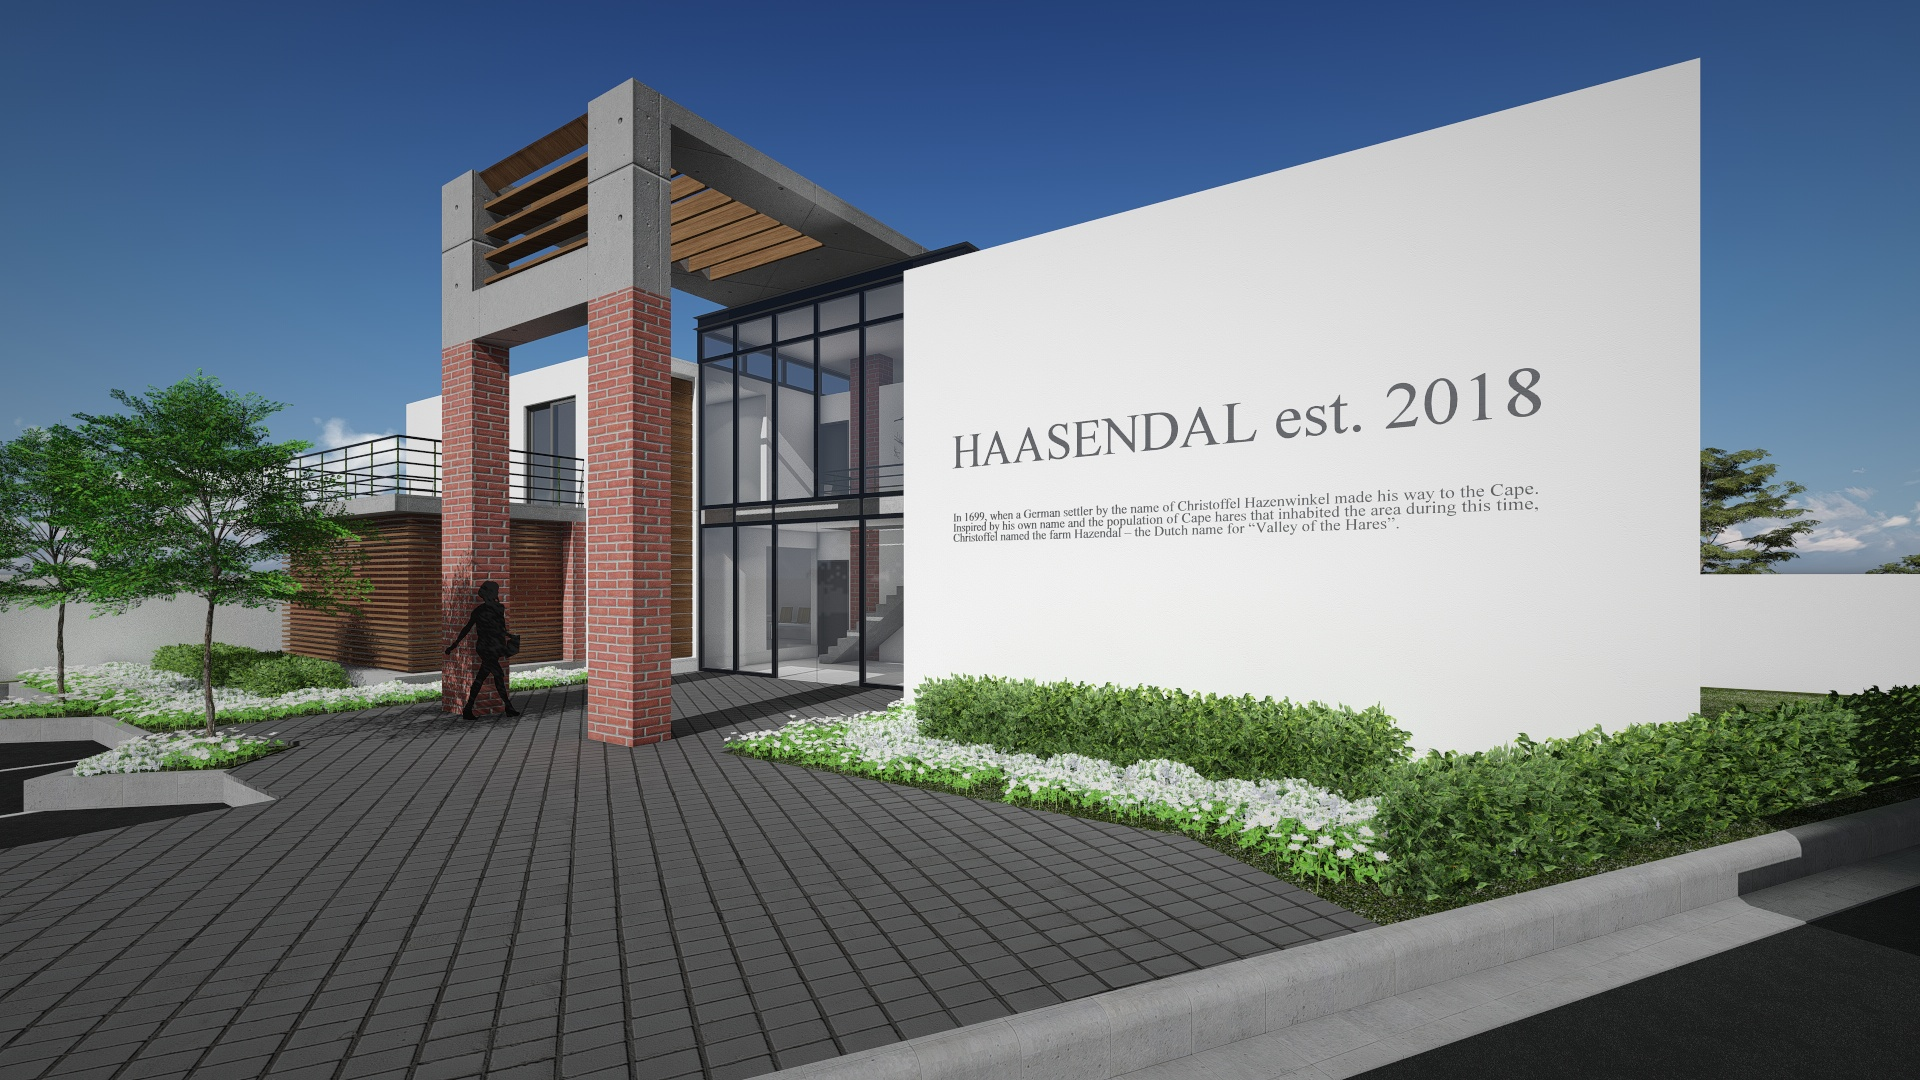 Haasendal Estate Planned Entrance